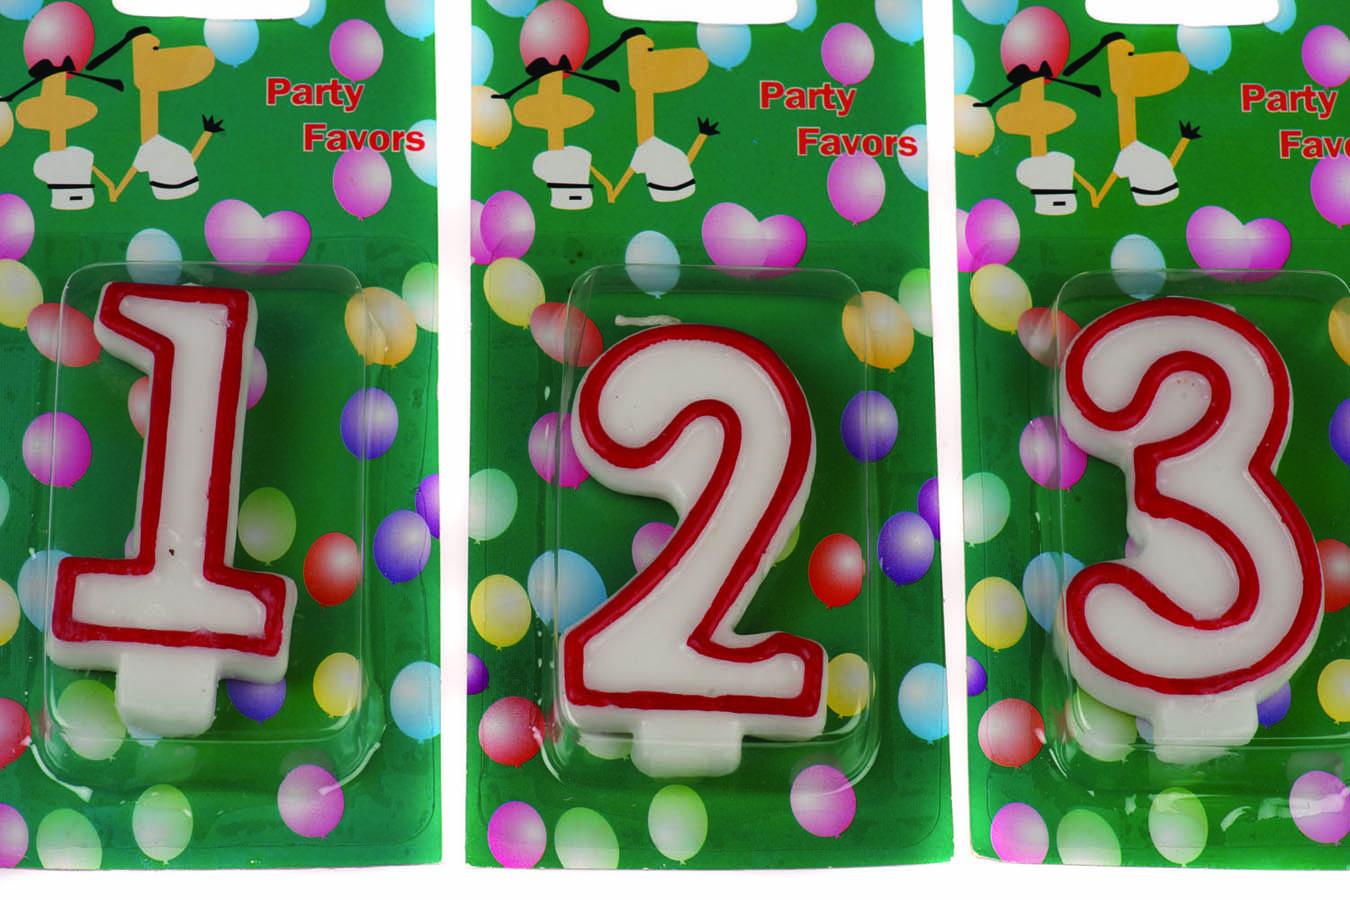 Birthday Candles Νο1,2,3